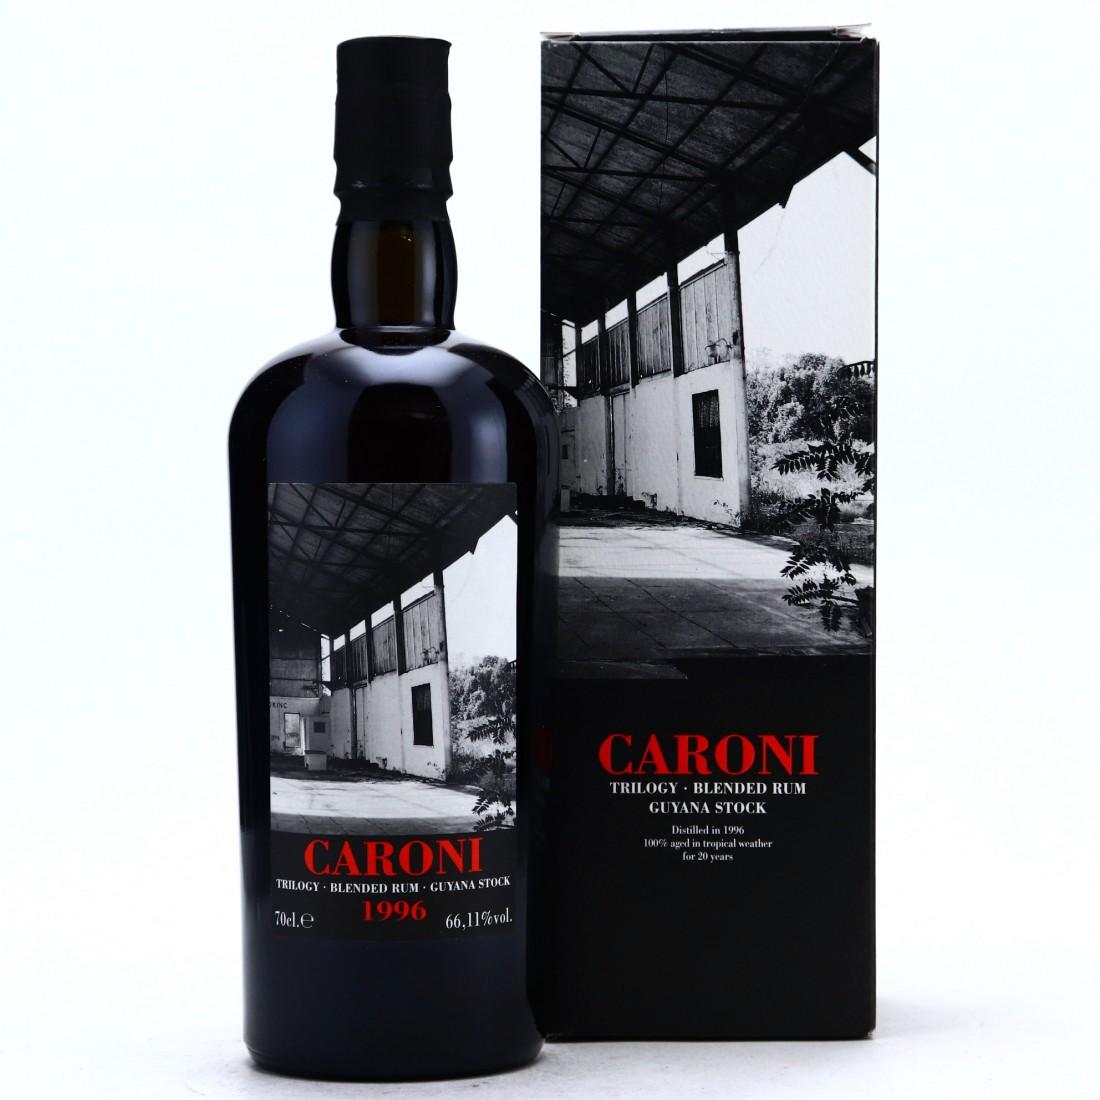 Caroni 1996 Velier 20 Year Old Guyana Stock Cask #5541 / LMDW Trilogy